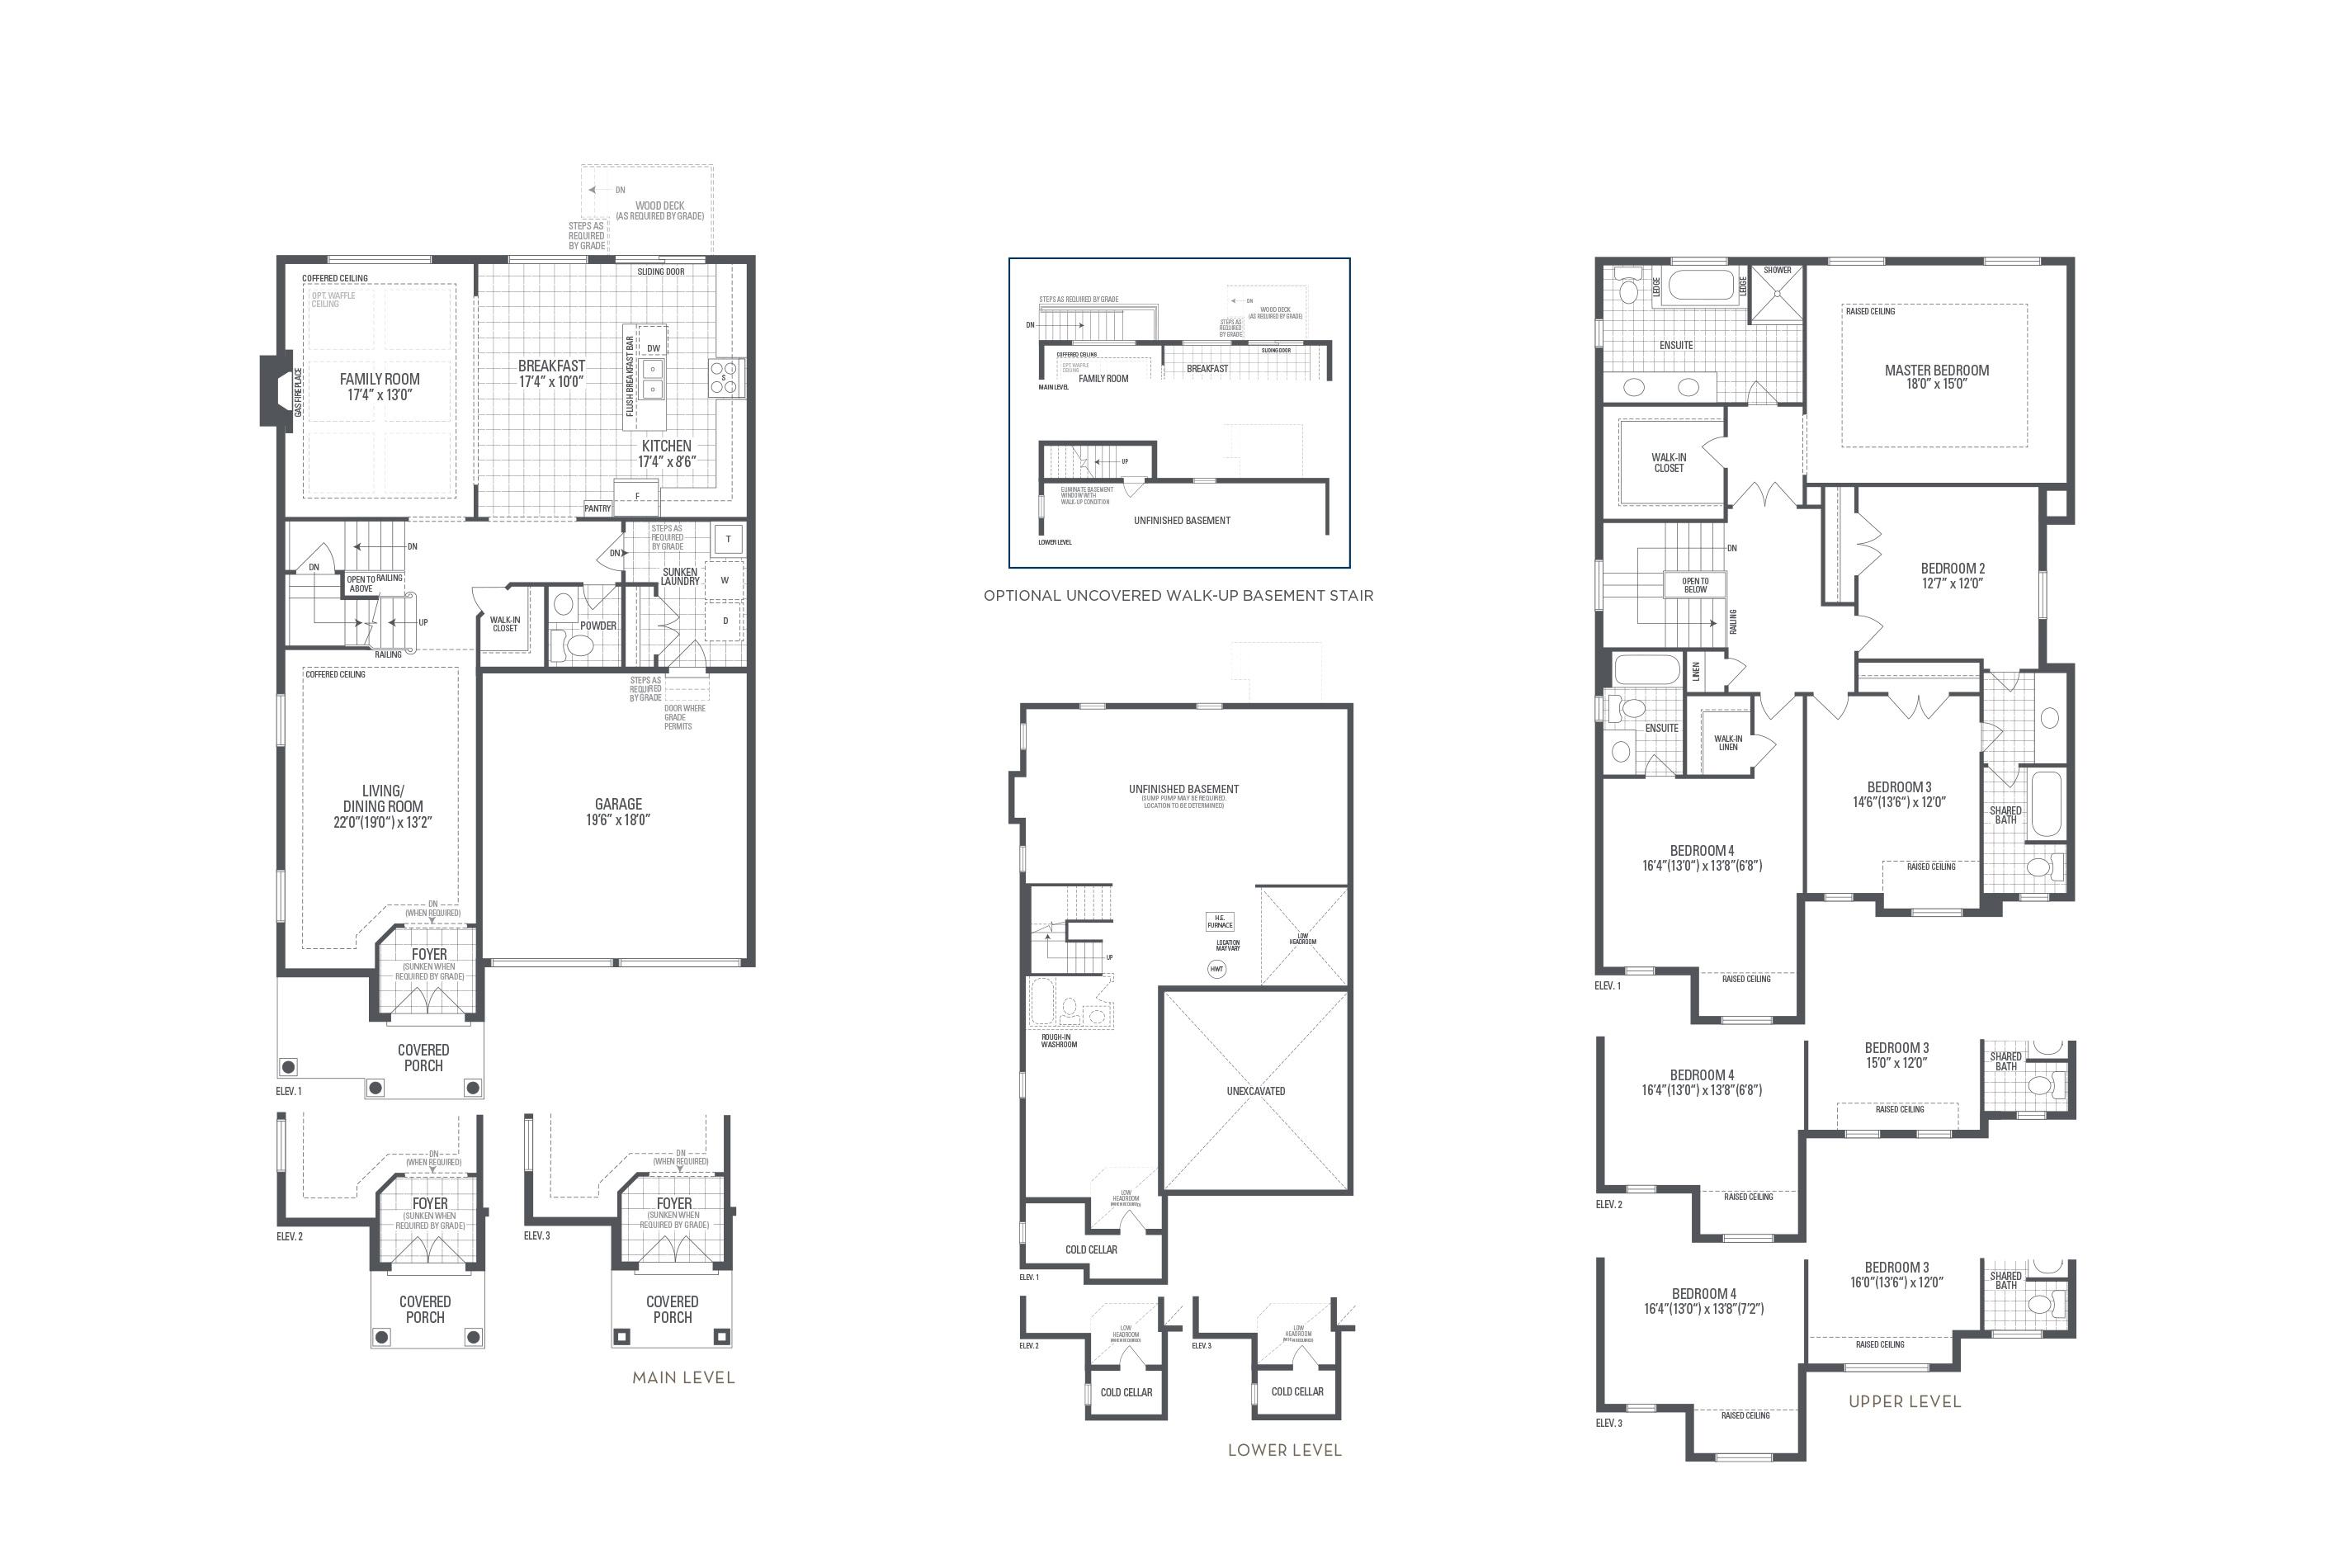 Manhattan 02 Elev. 2 Floorplan Thumbnail